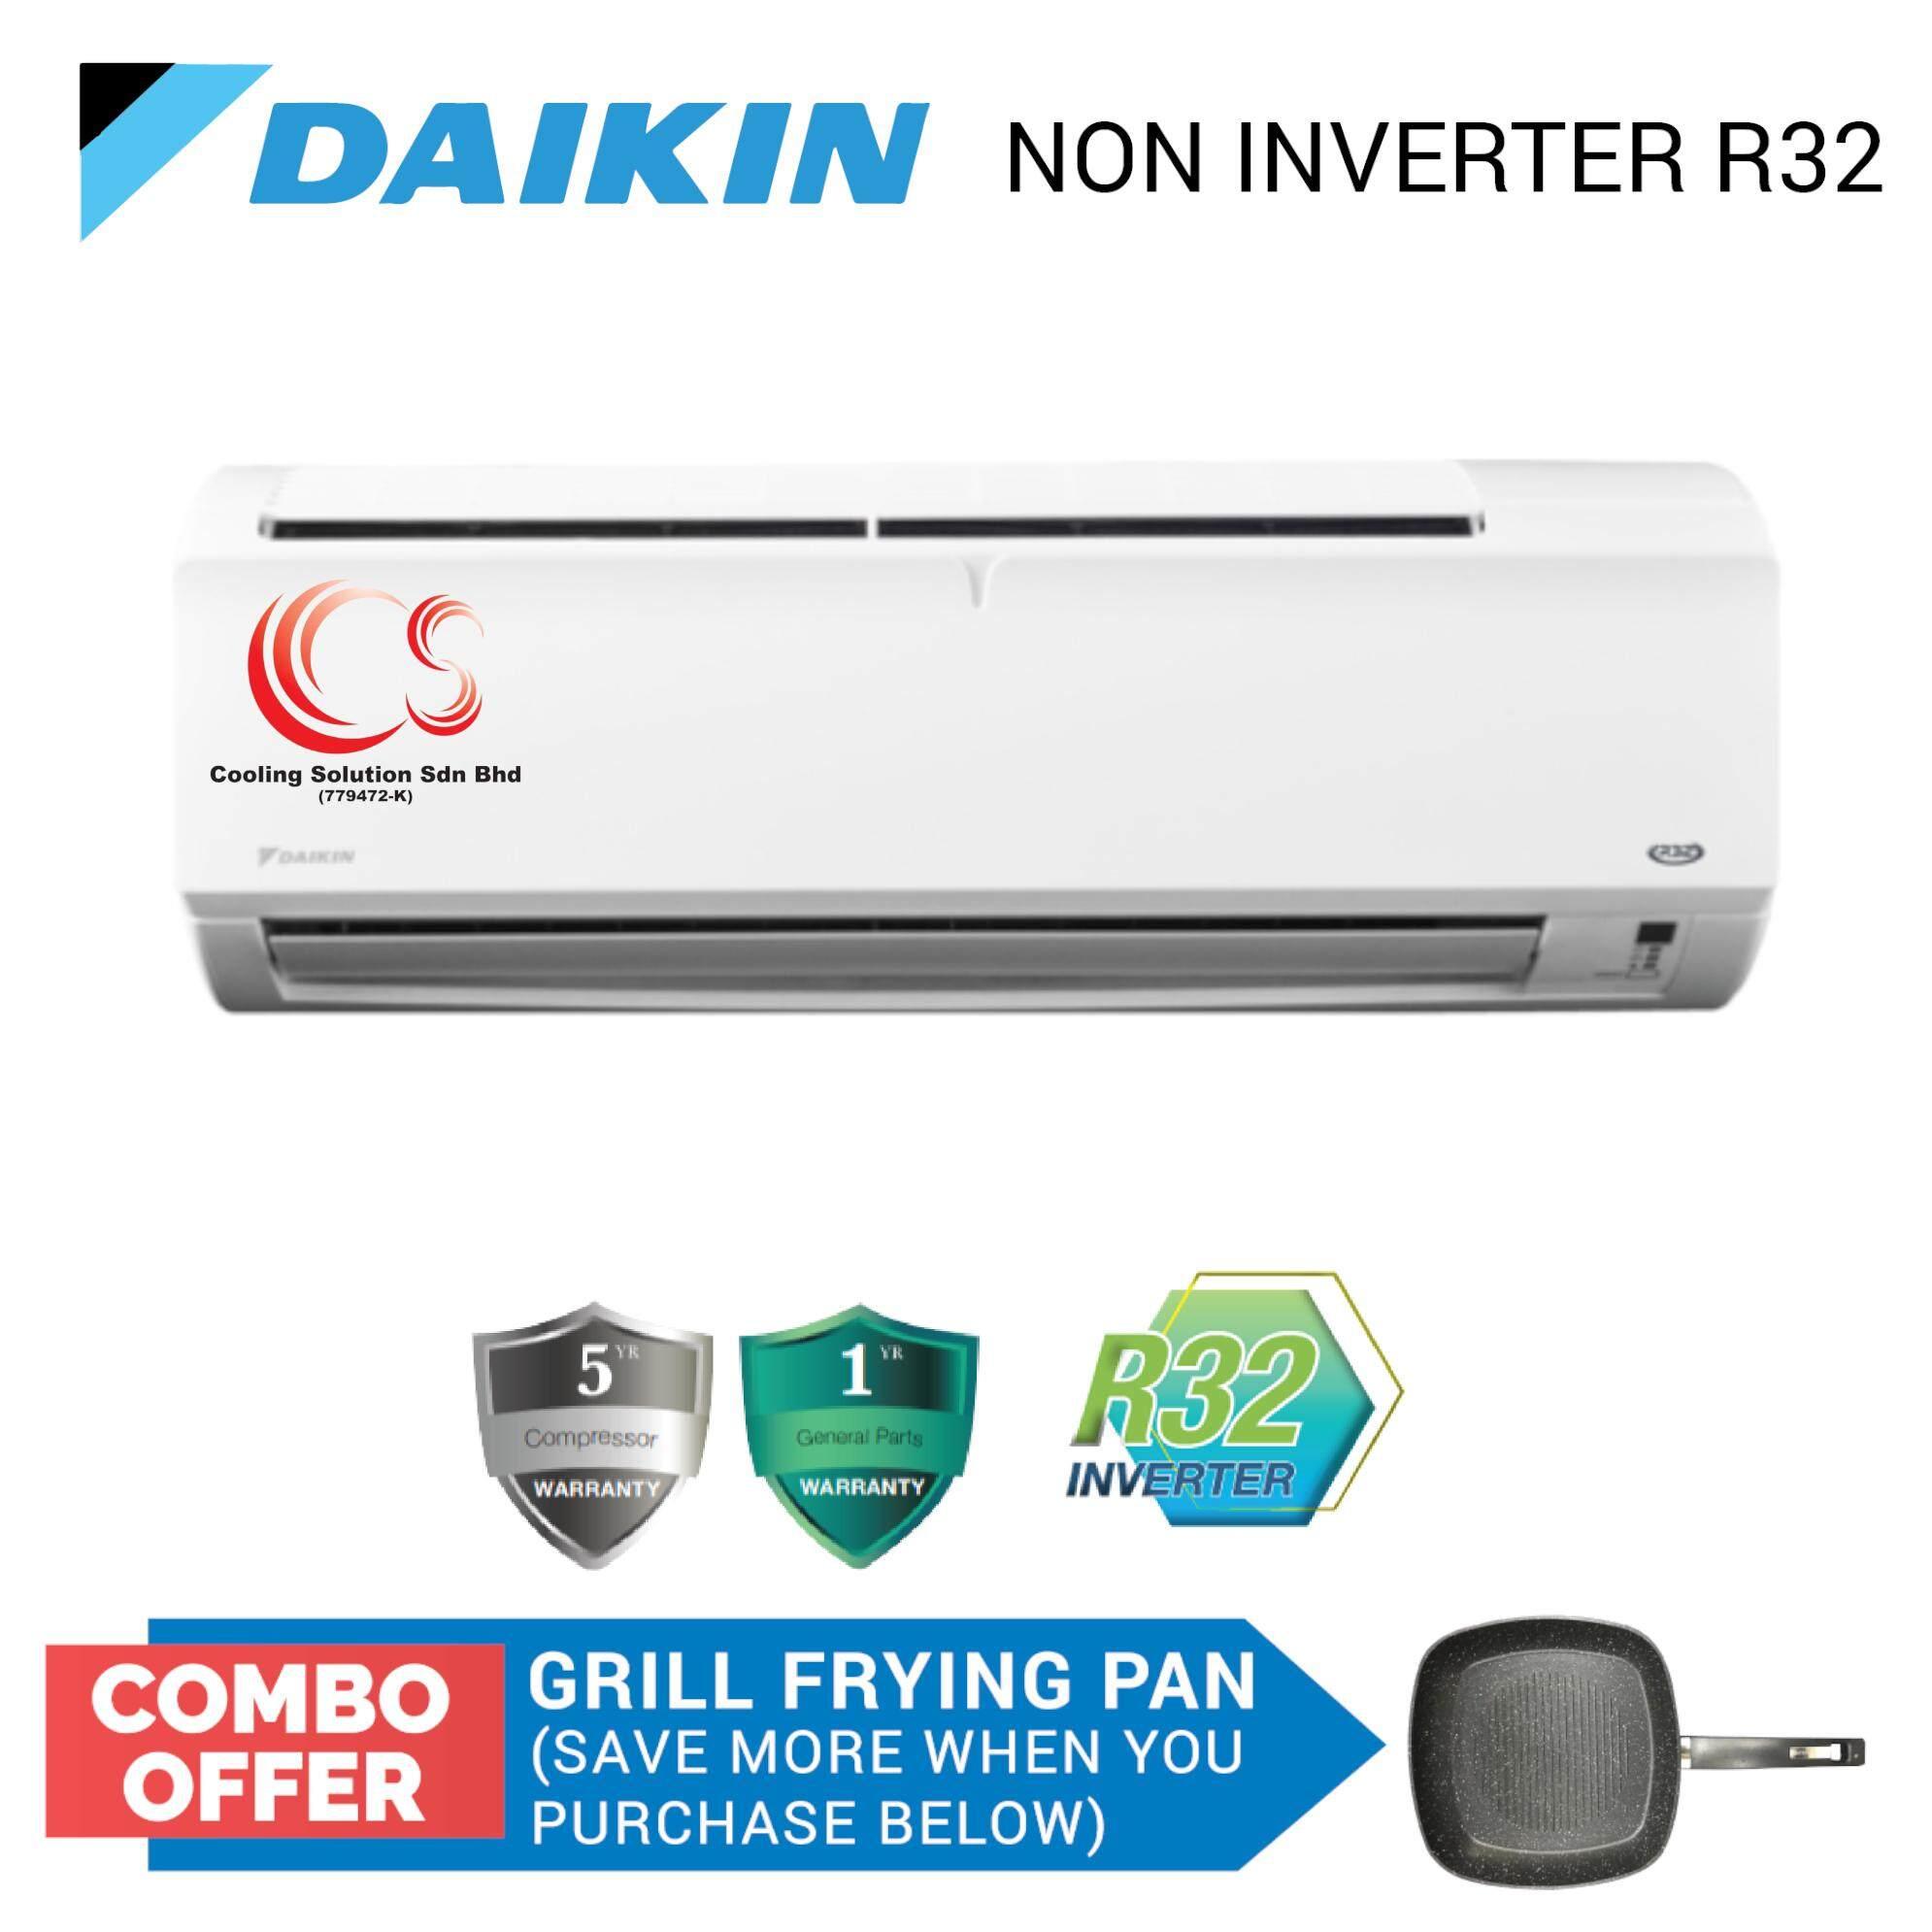 DAIKIN Air Conditioner Non Inverter R32 1 0HP FTV28P